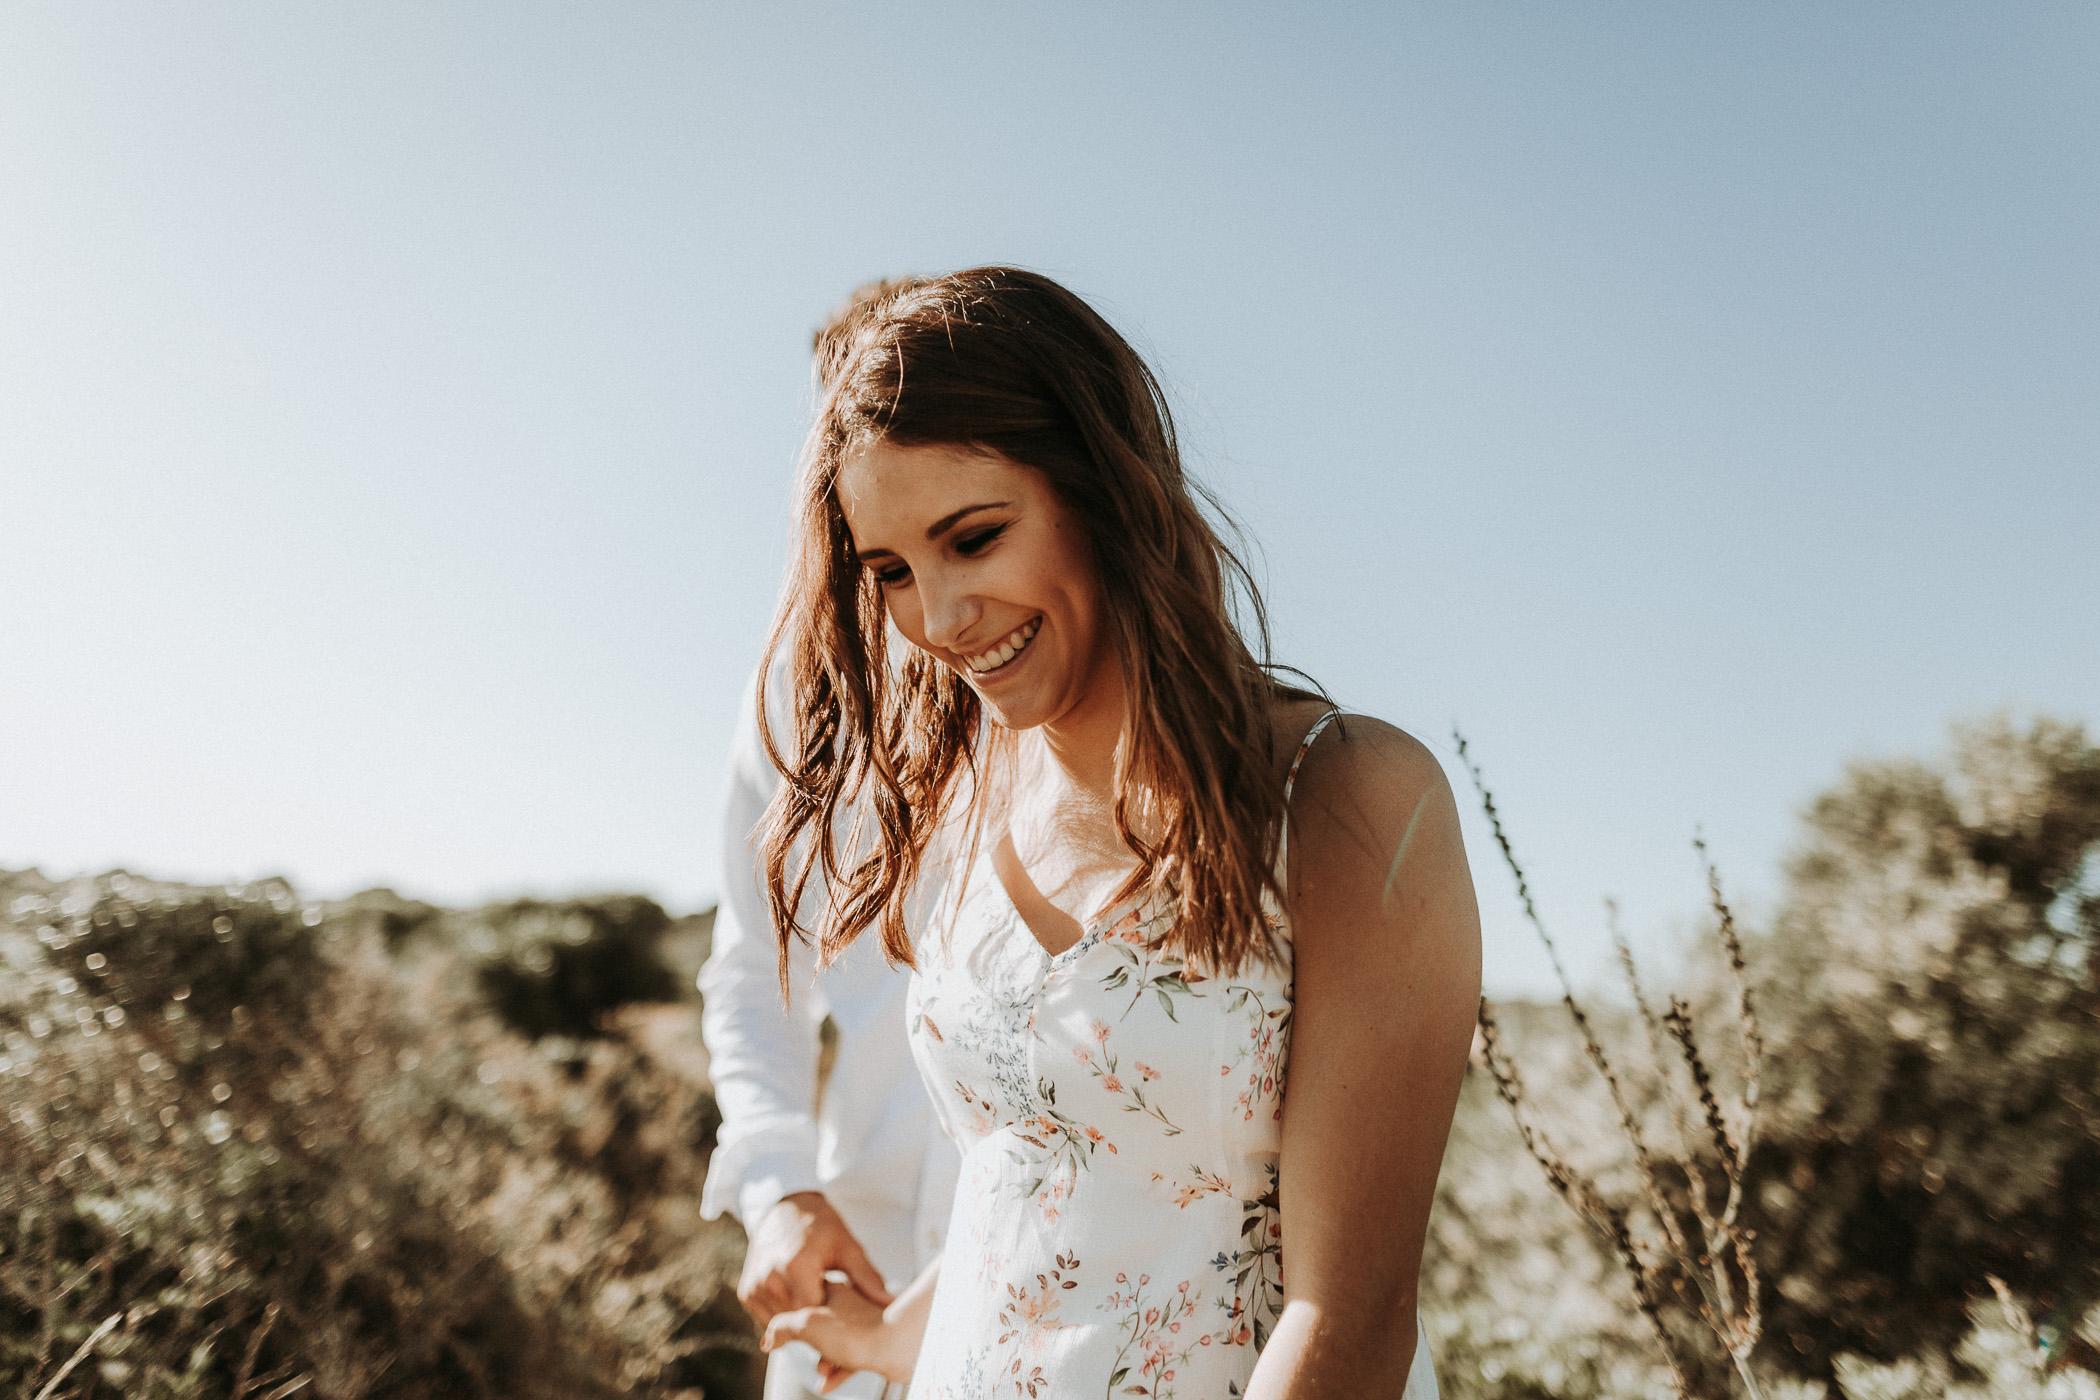 DanielaMarquardtPhotography_wedding_elopement_mallorca_spain_calapi_palma_lauraandtoni_218